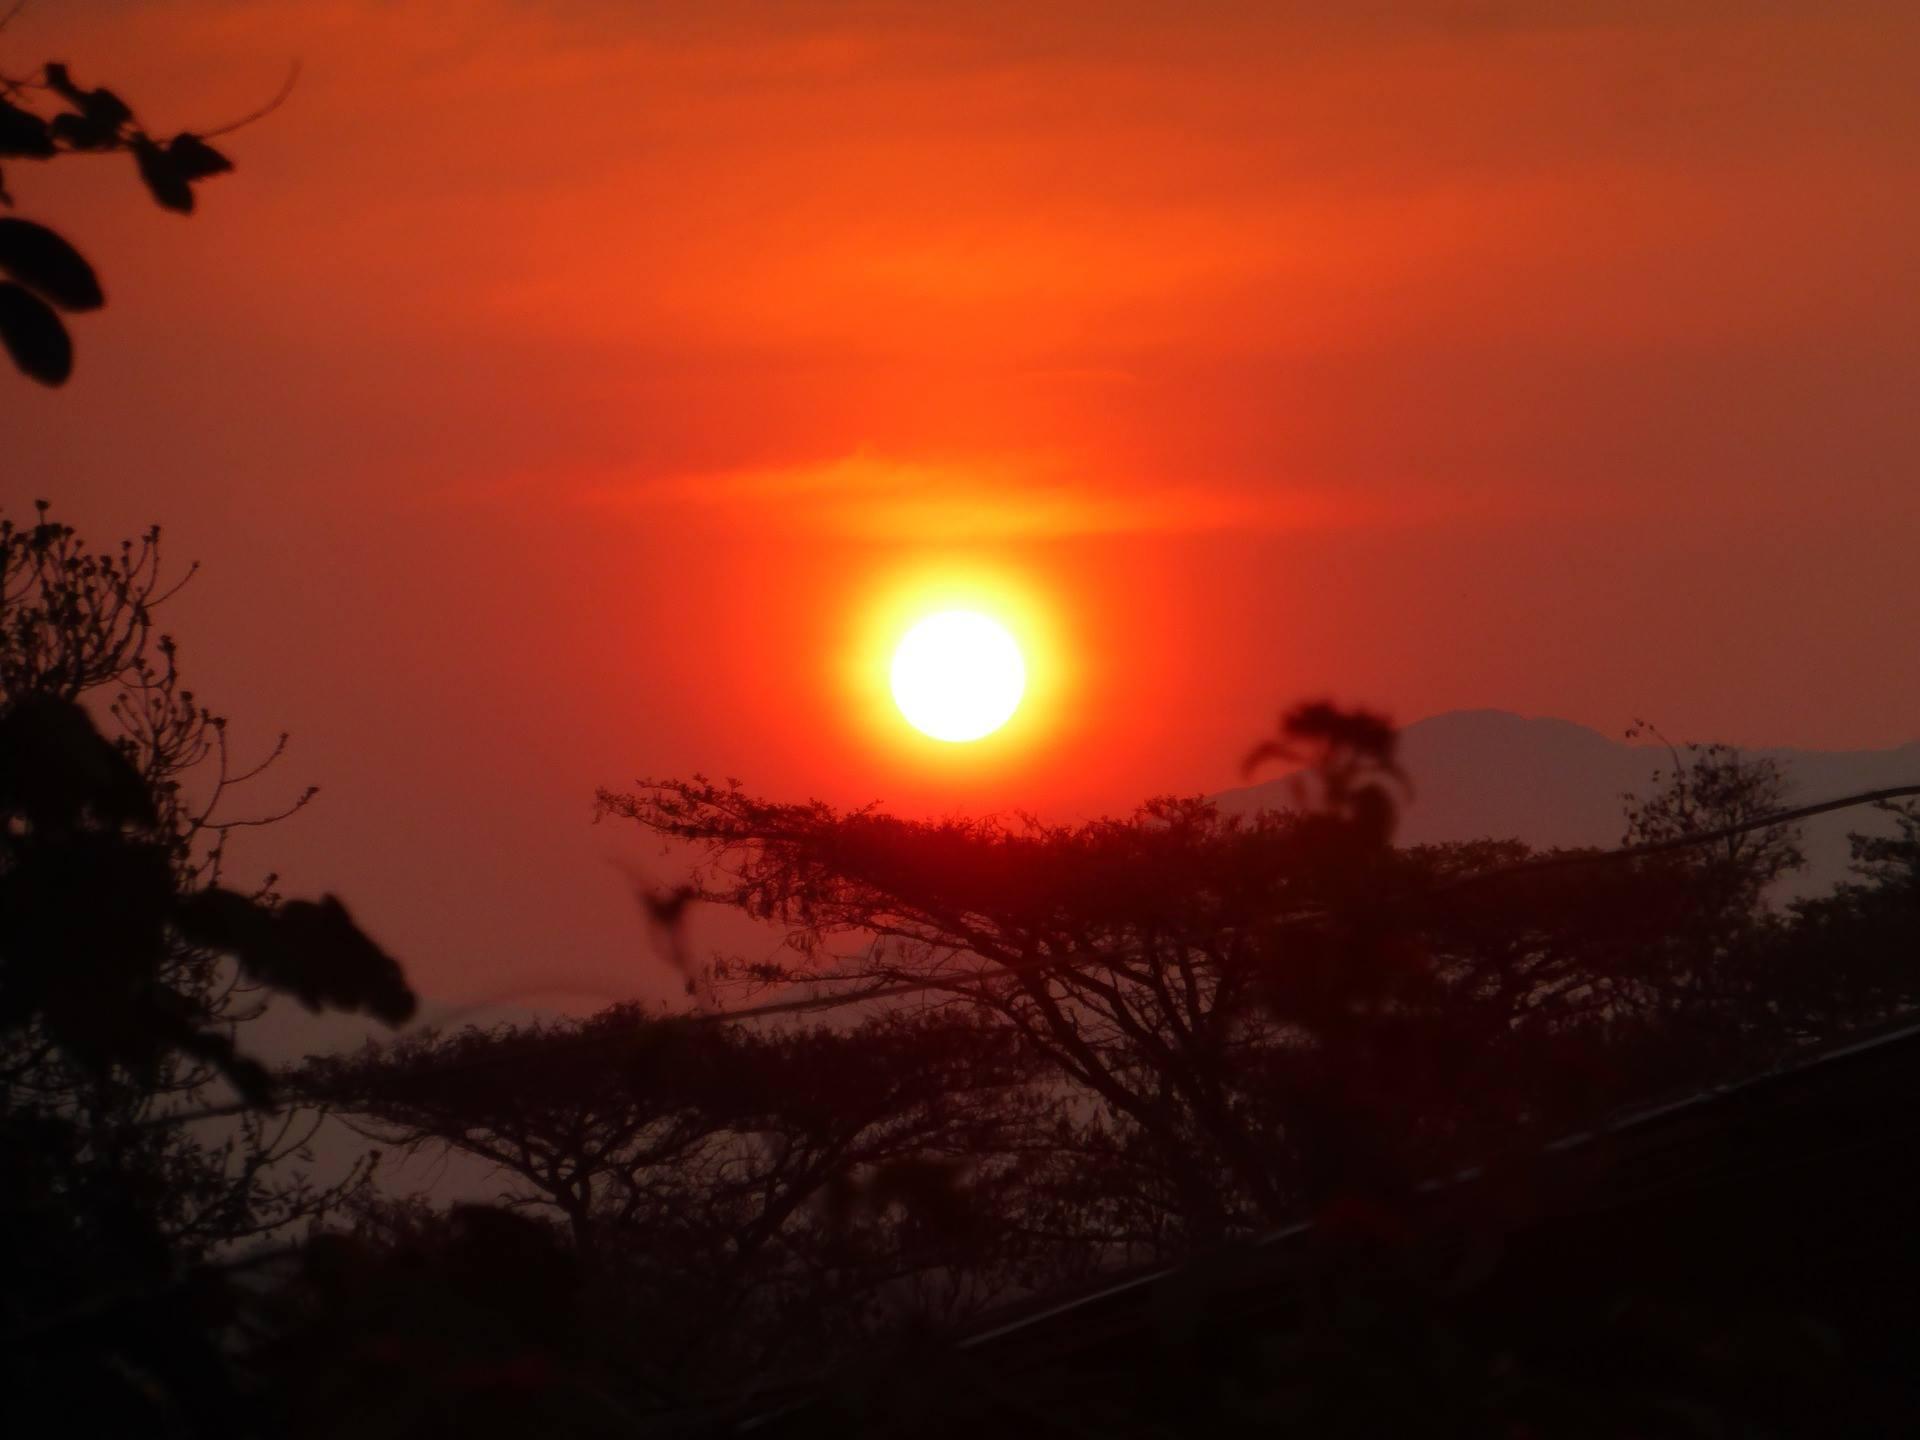 Boa Noite Deus Abencoe: Boa Noite Para Amigo, Que Deus Abençoe Cada Minuto De Sua